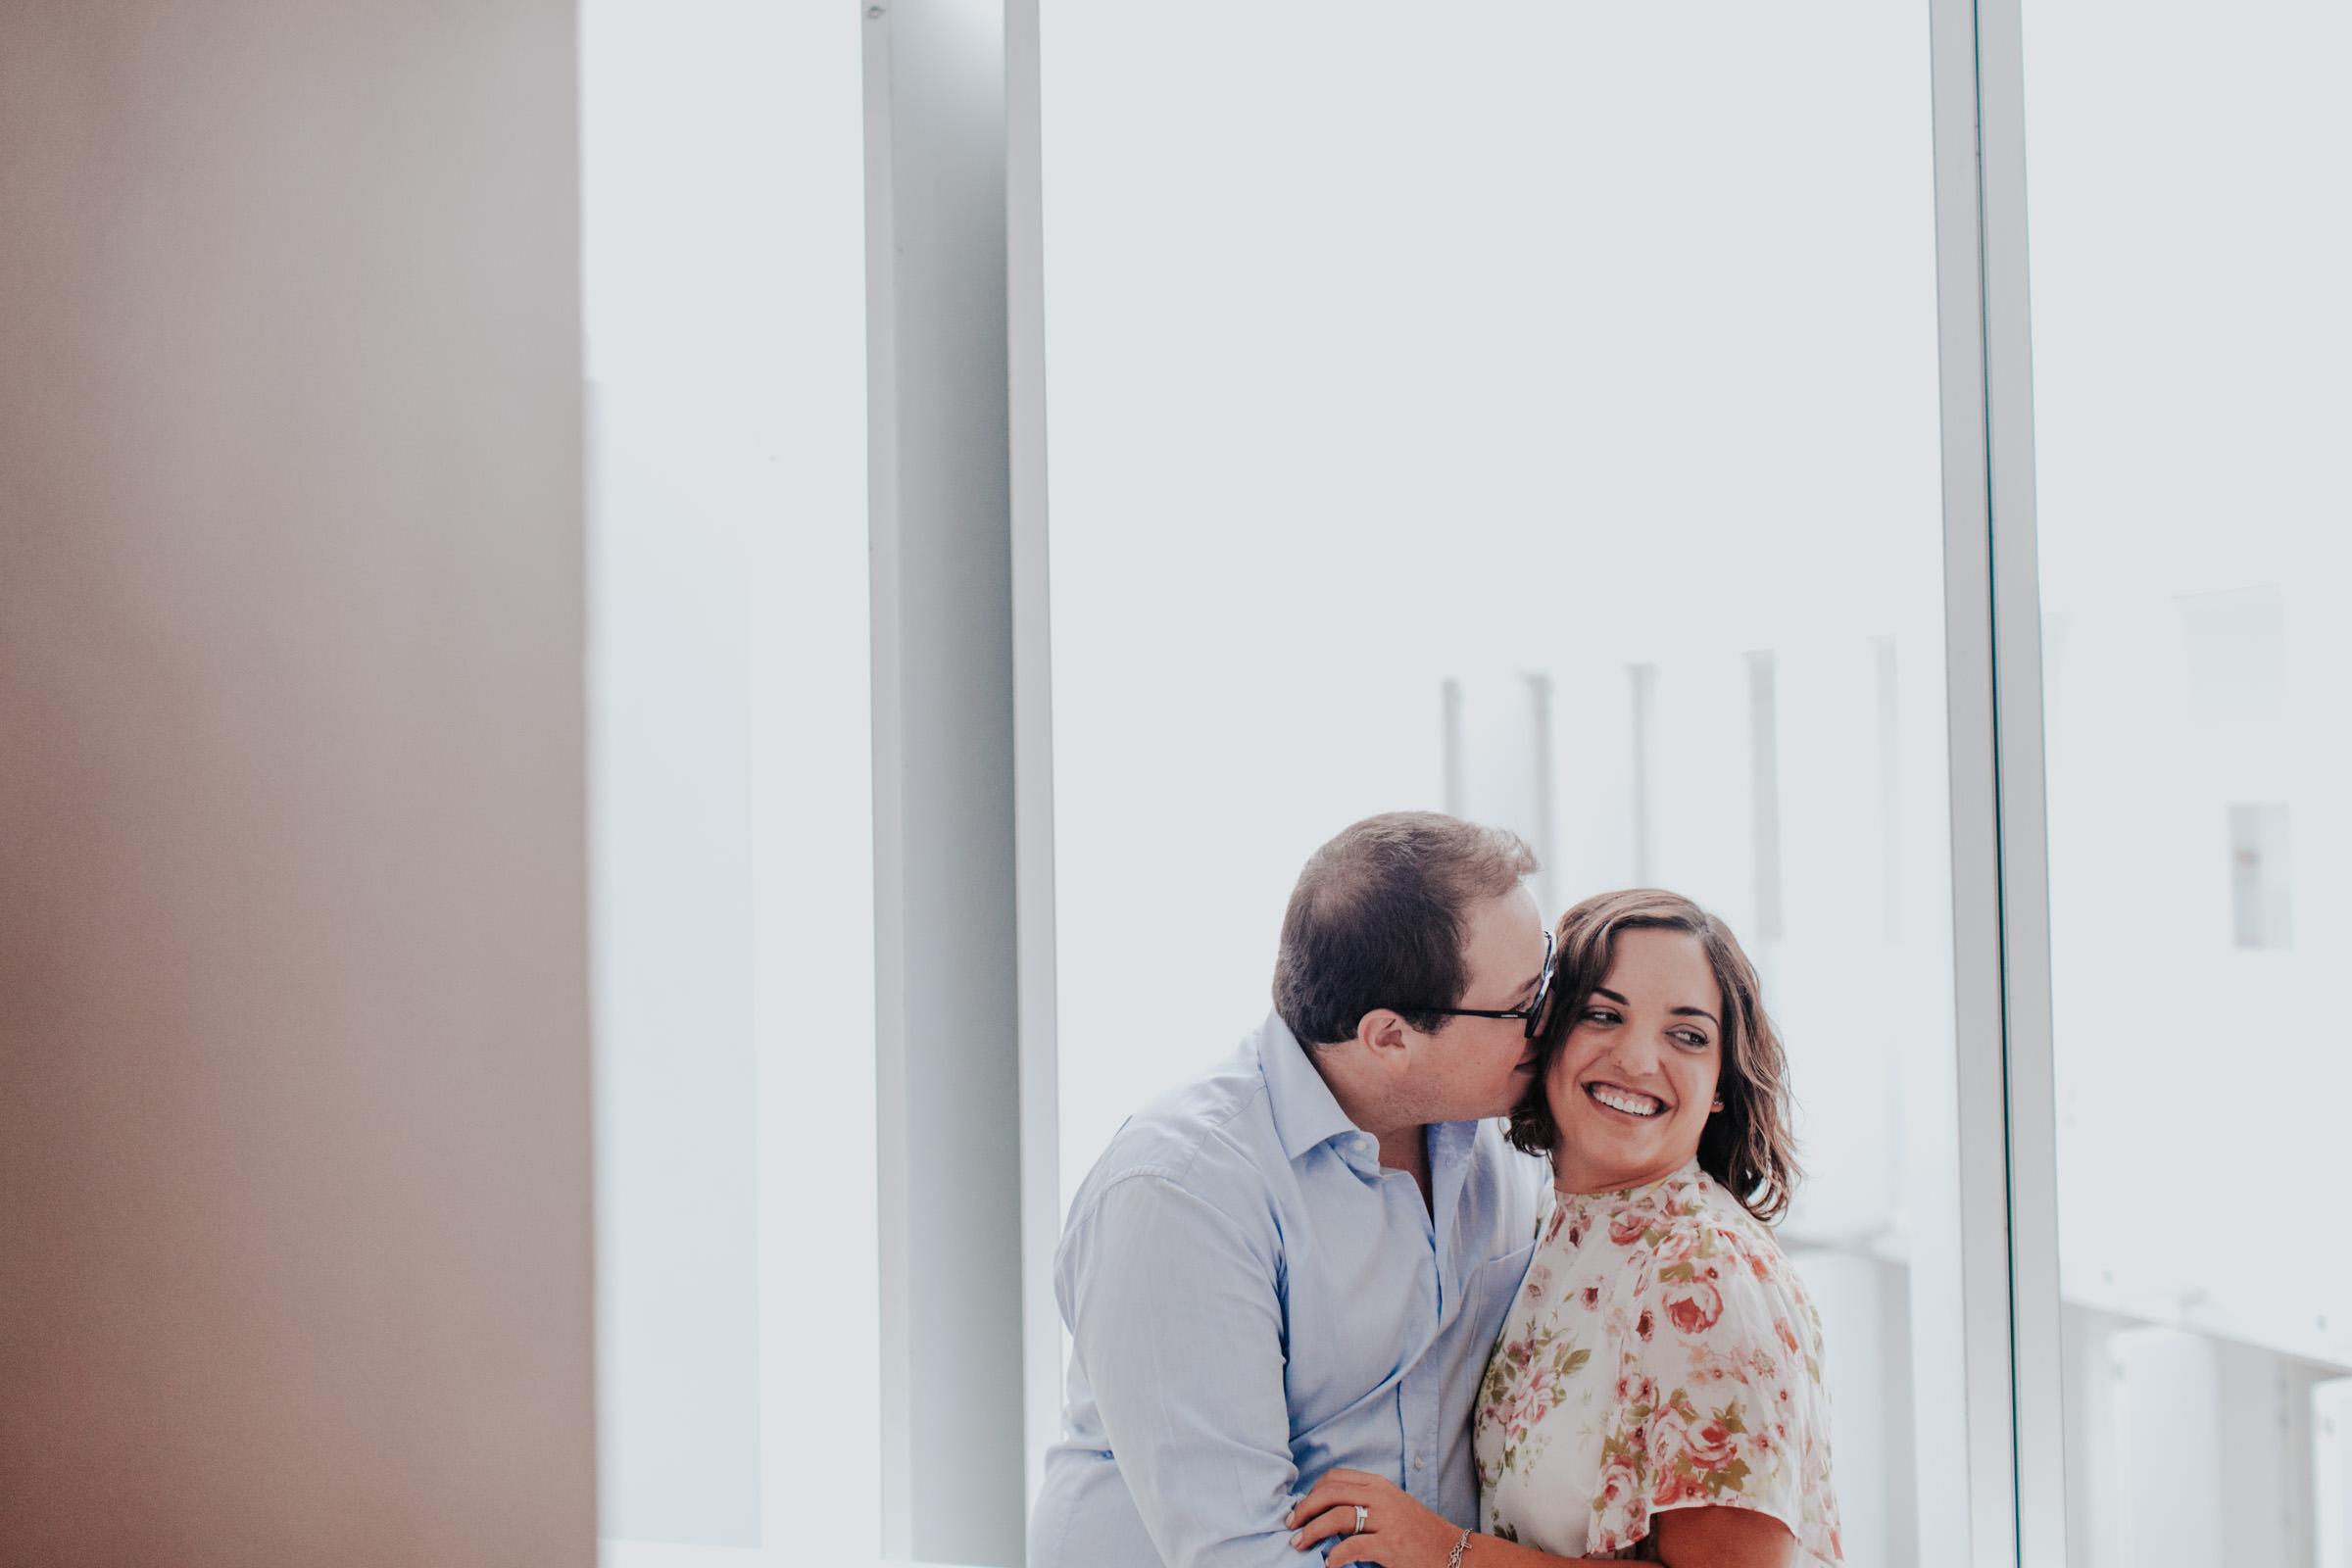 Fotografo-Boda-Hotel-Condesa-DF-Mexico-CDMX-Photography-Wedding-Pierce-42.jpg